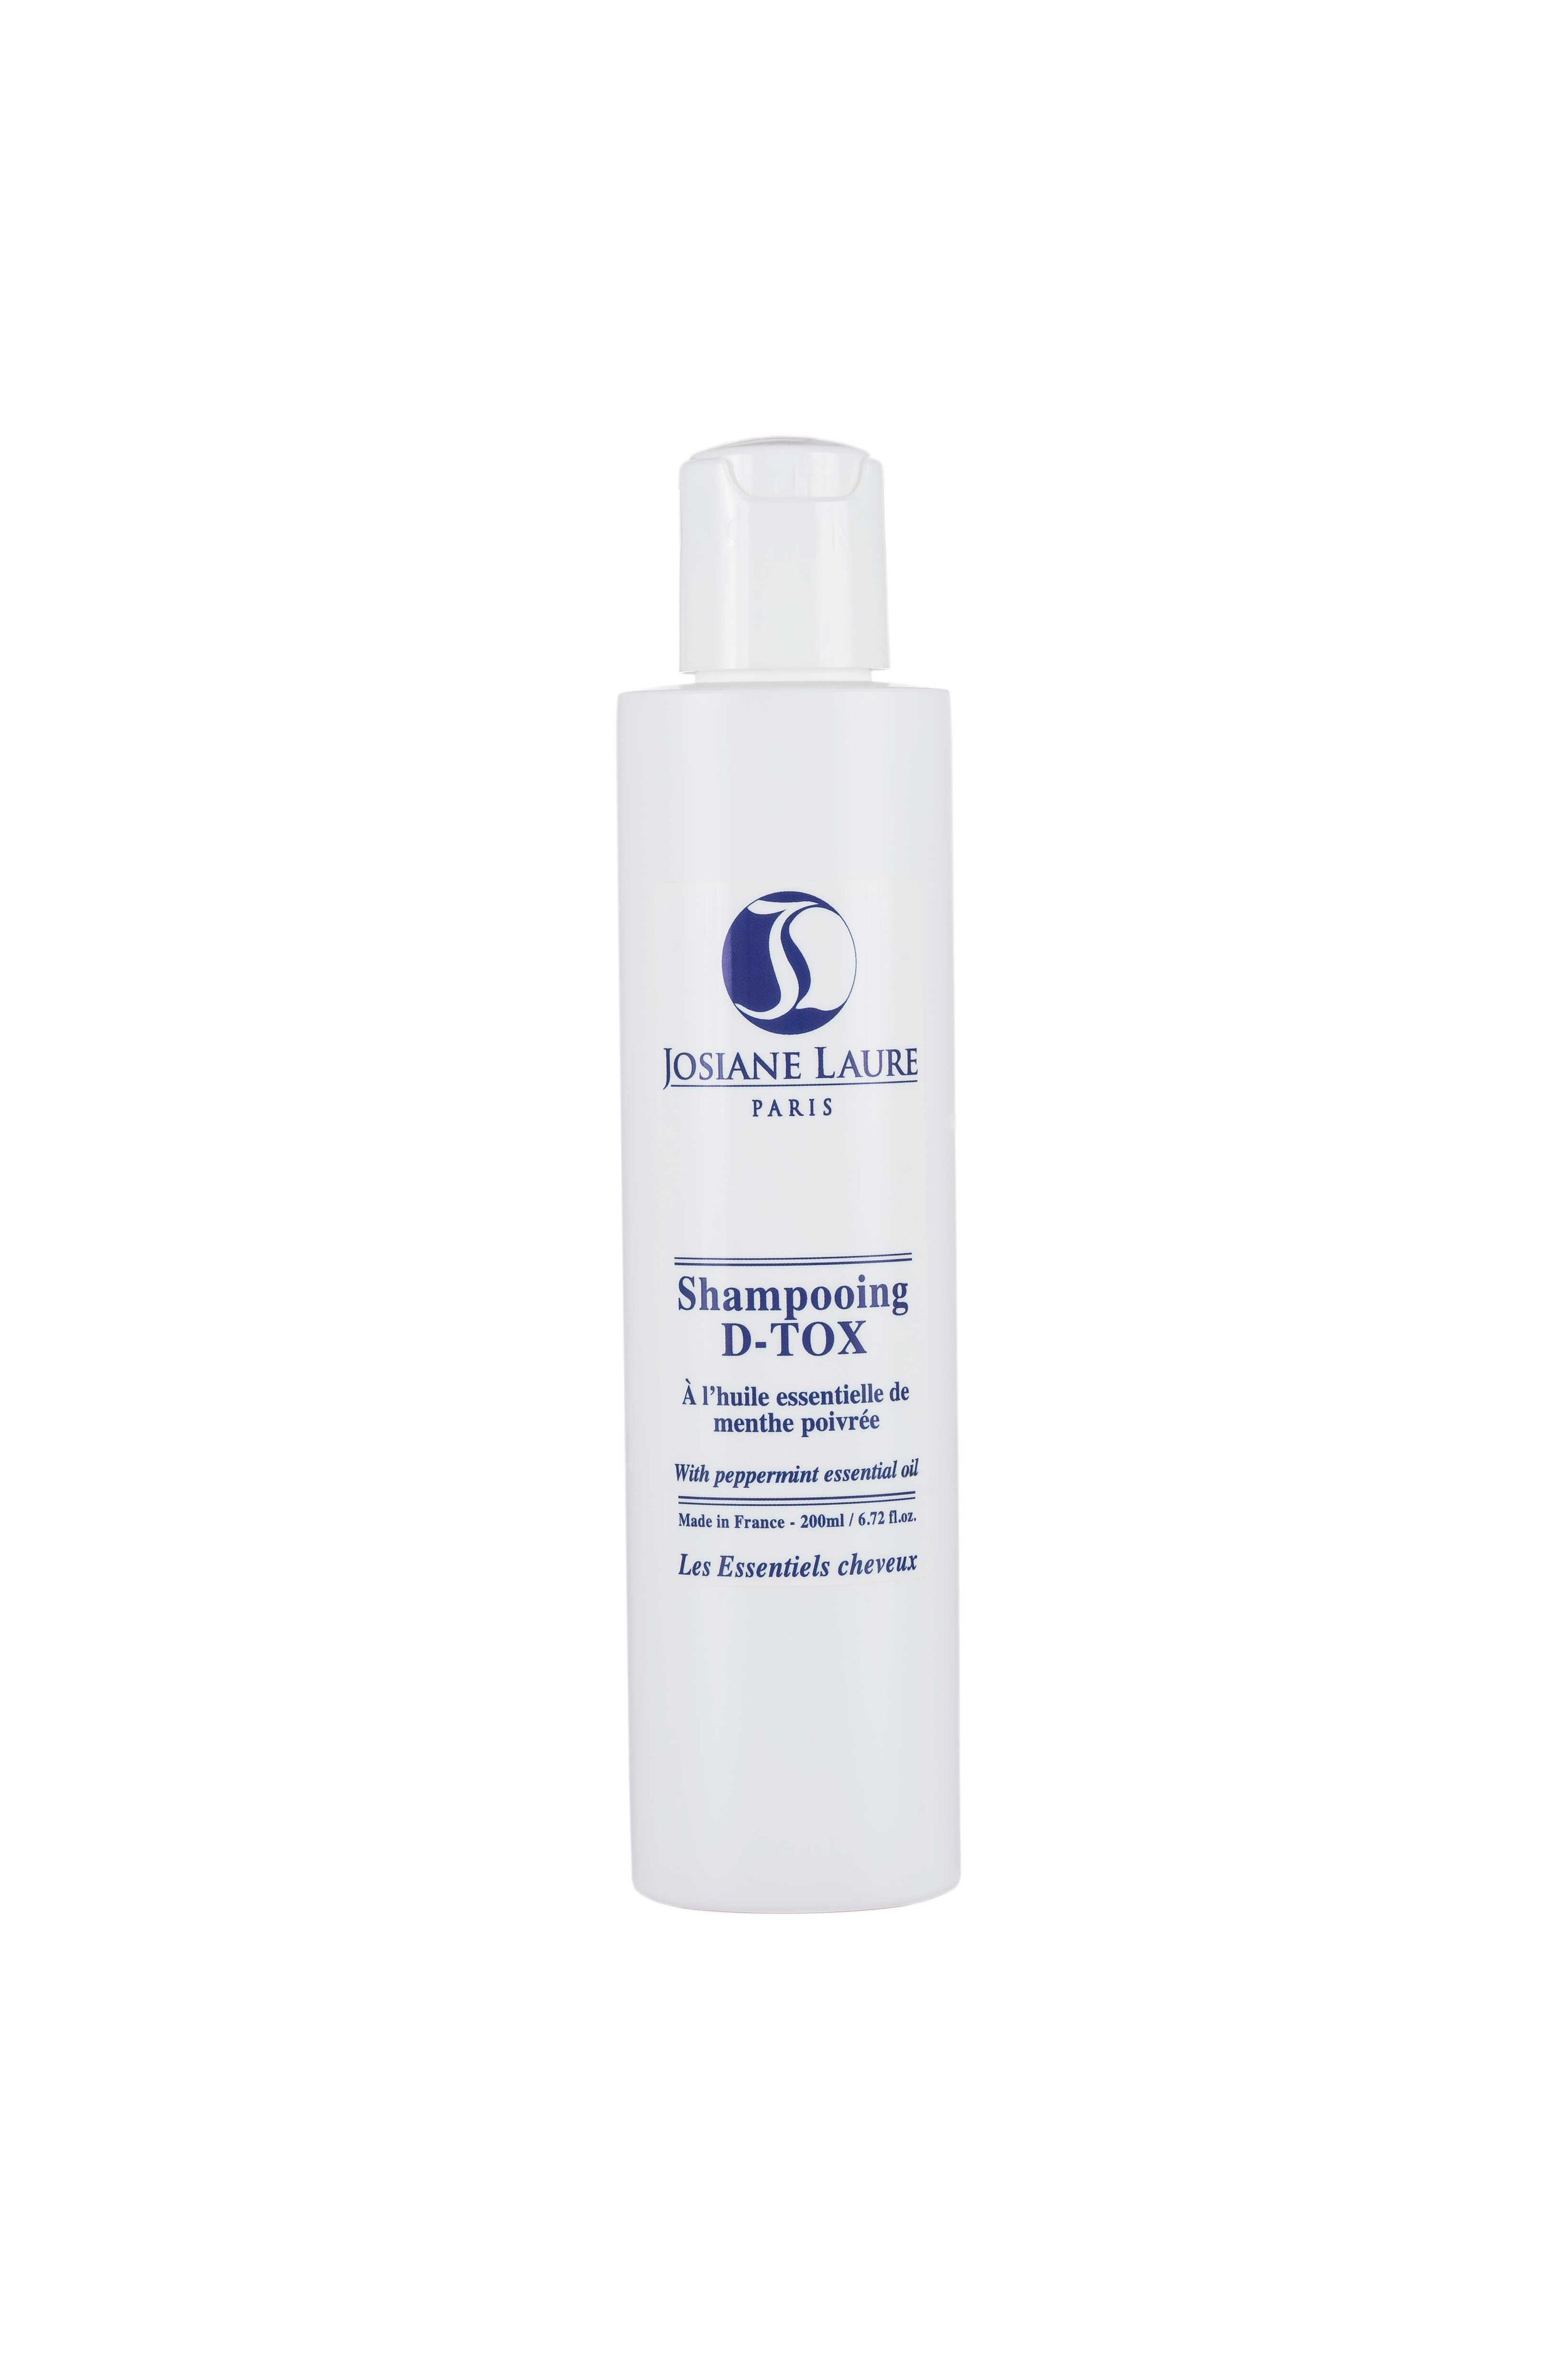 Shampoo Detox - photo.jpg